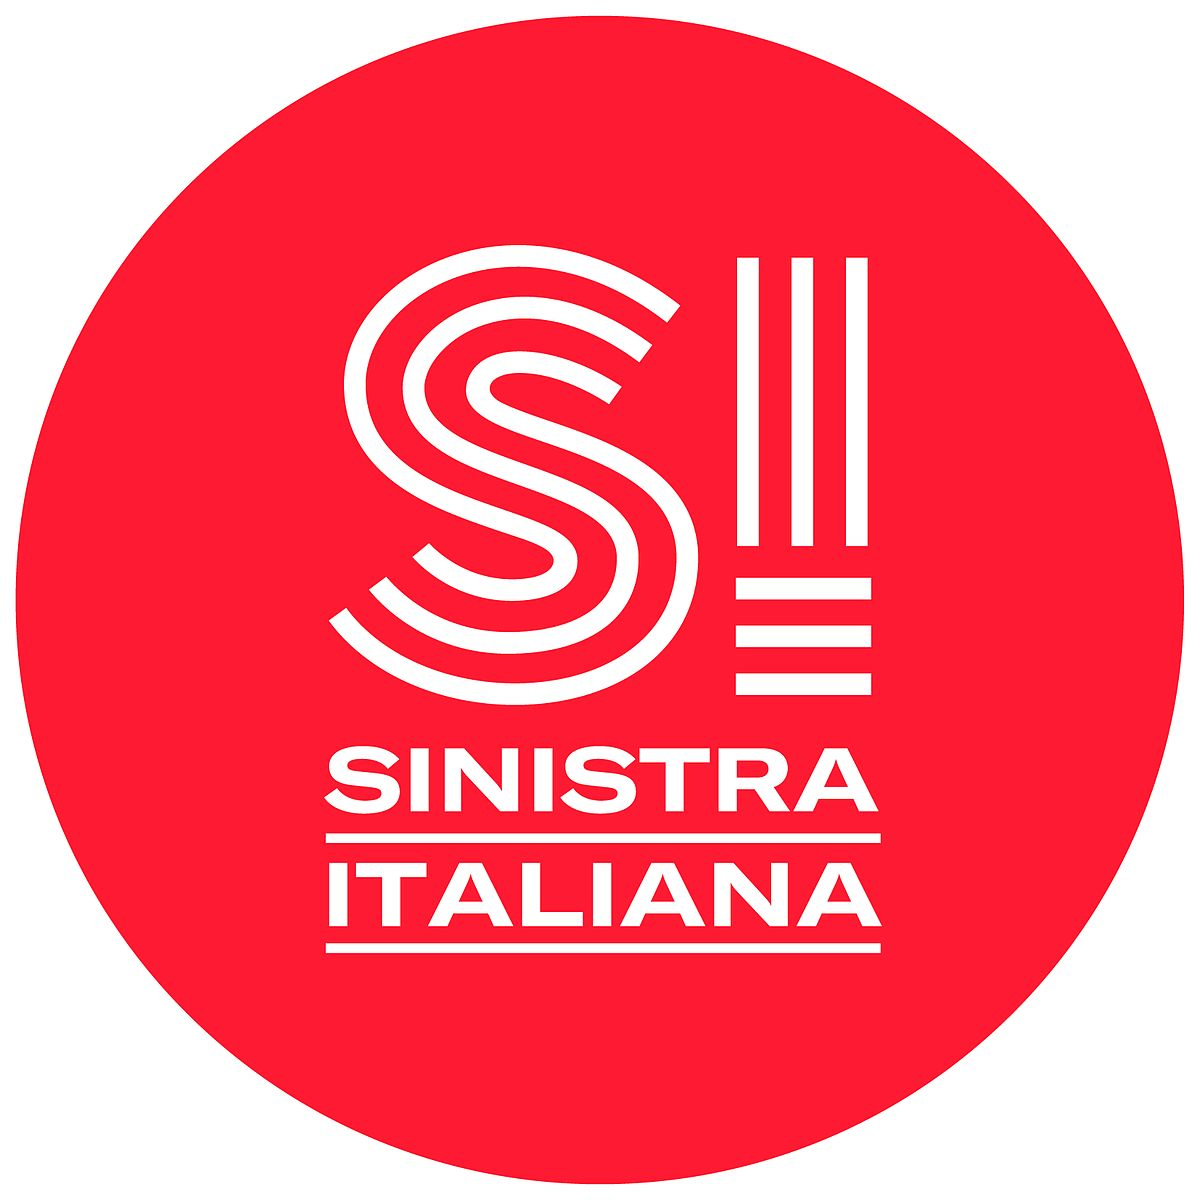 Sinistra italiana wikipedia for Politica italiana wikipedia